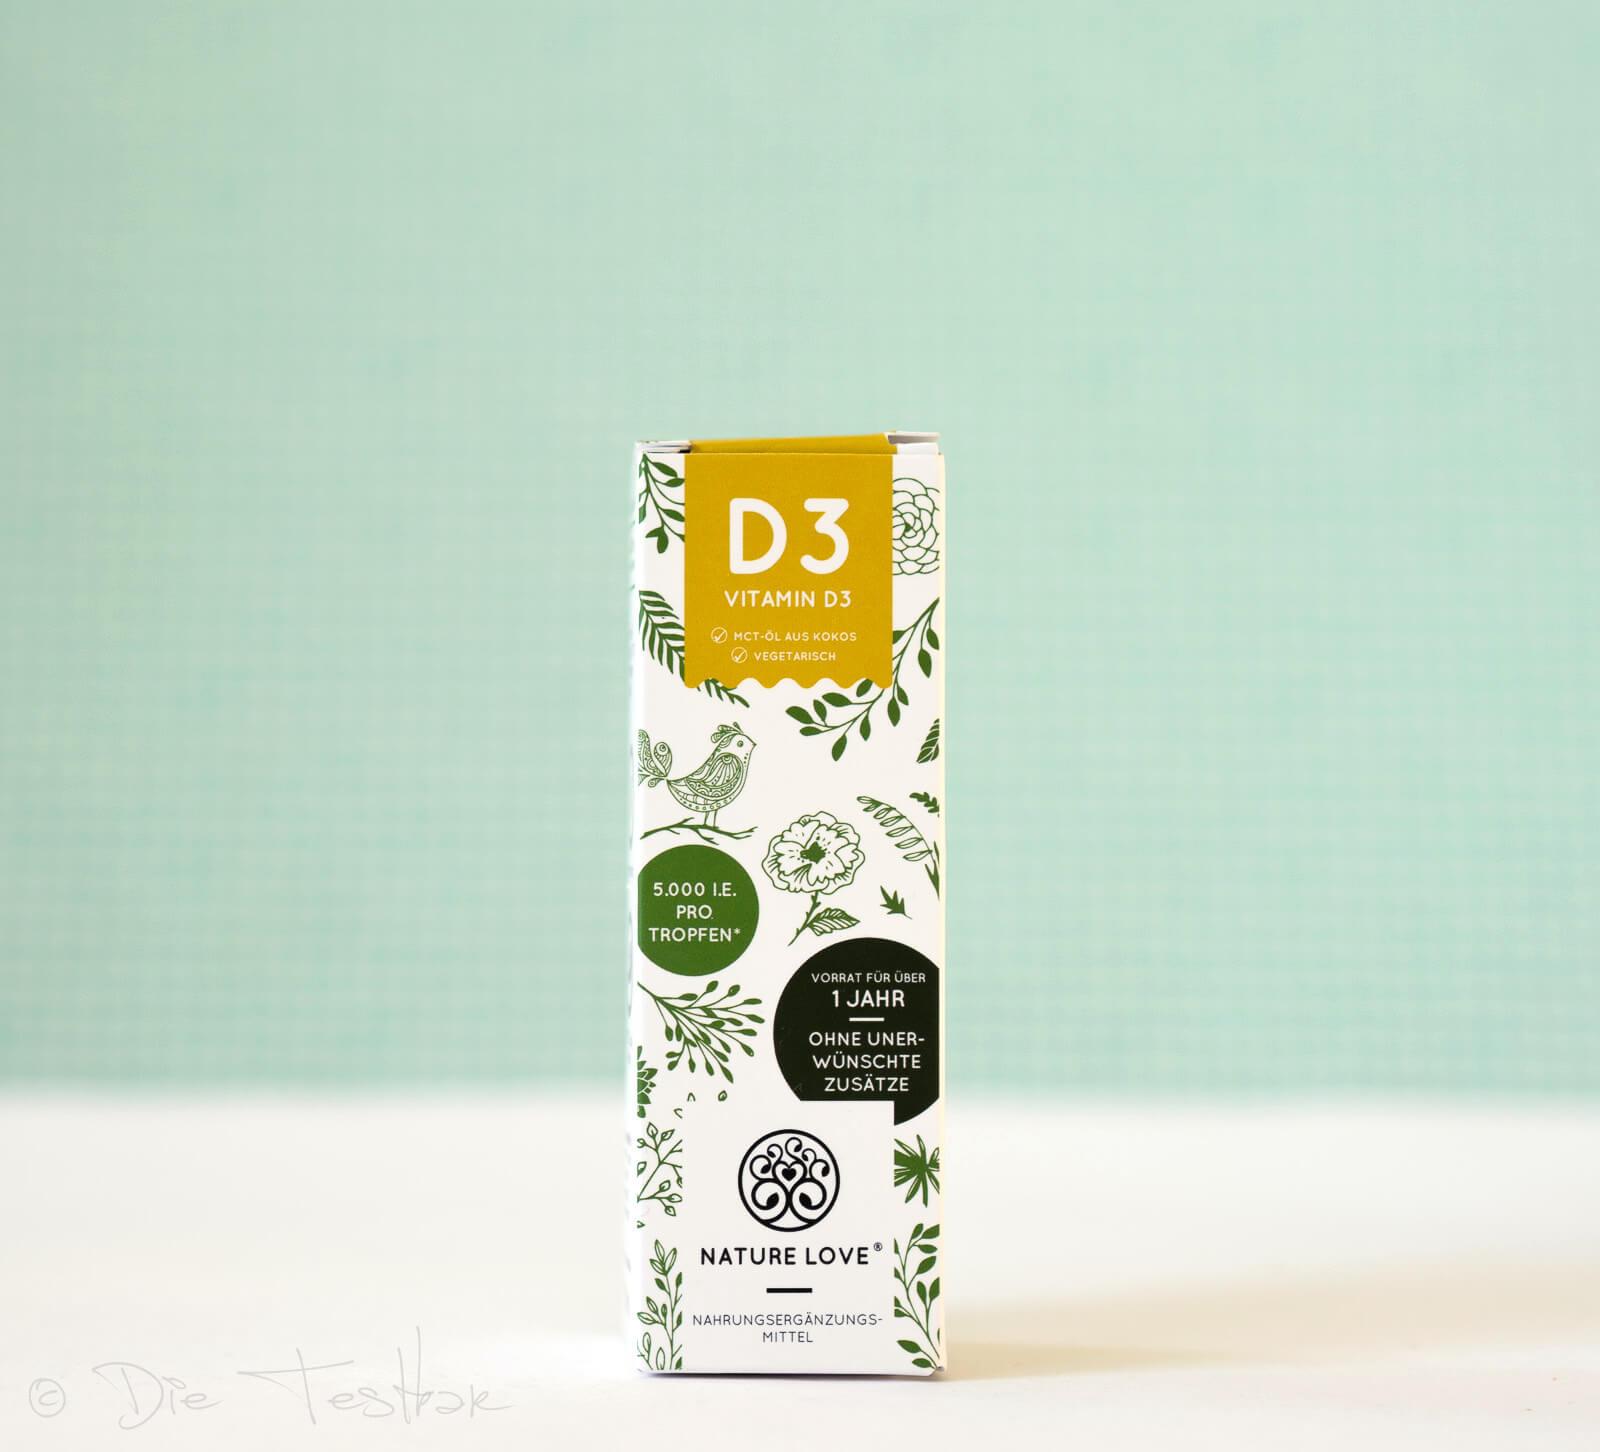 NATURE LOVE - Vitamin D3 mit 5000 I.E. pro Tropfen